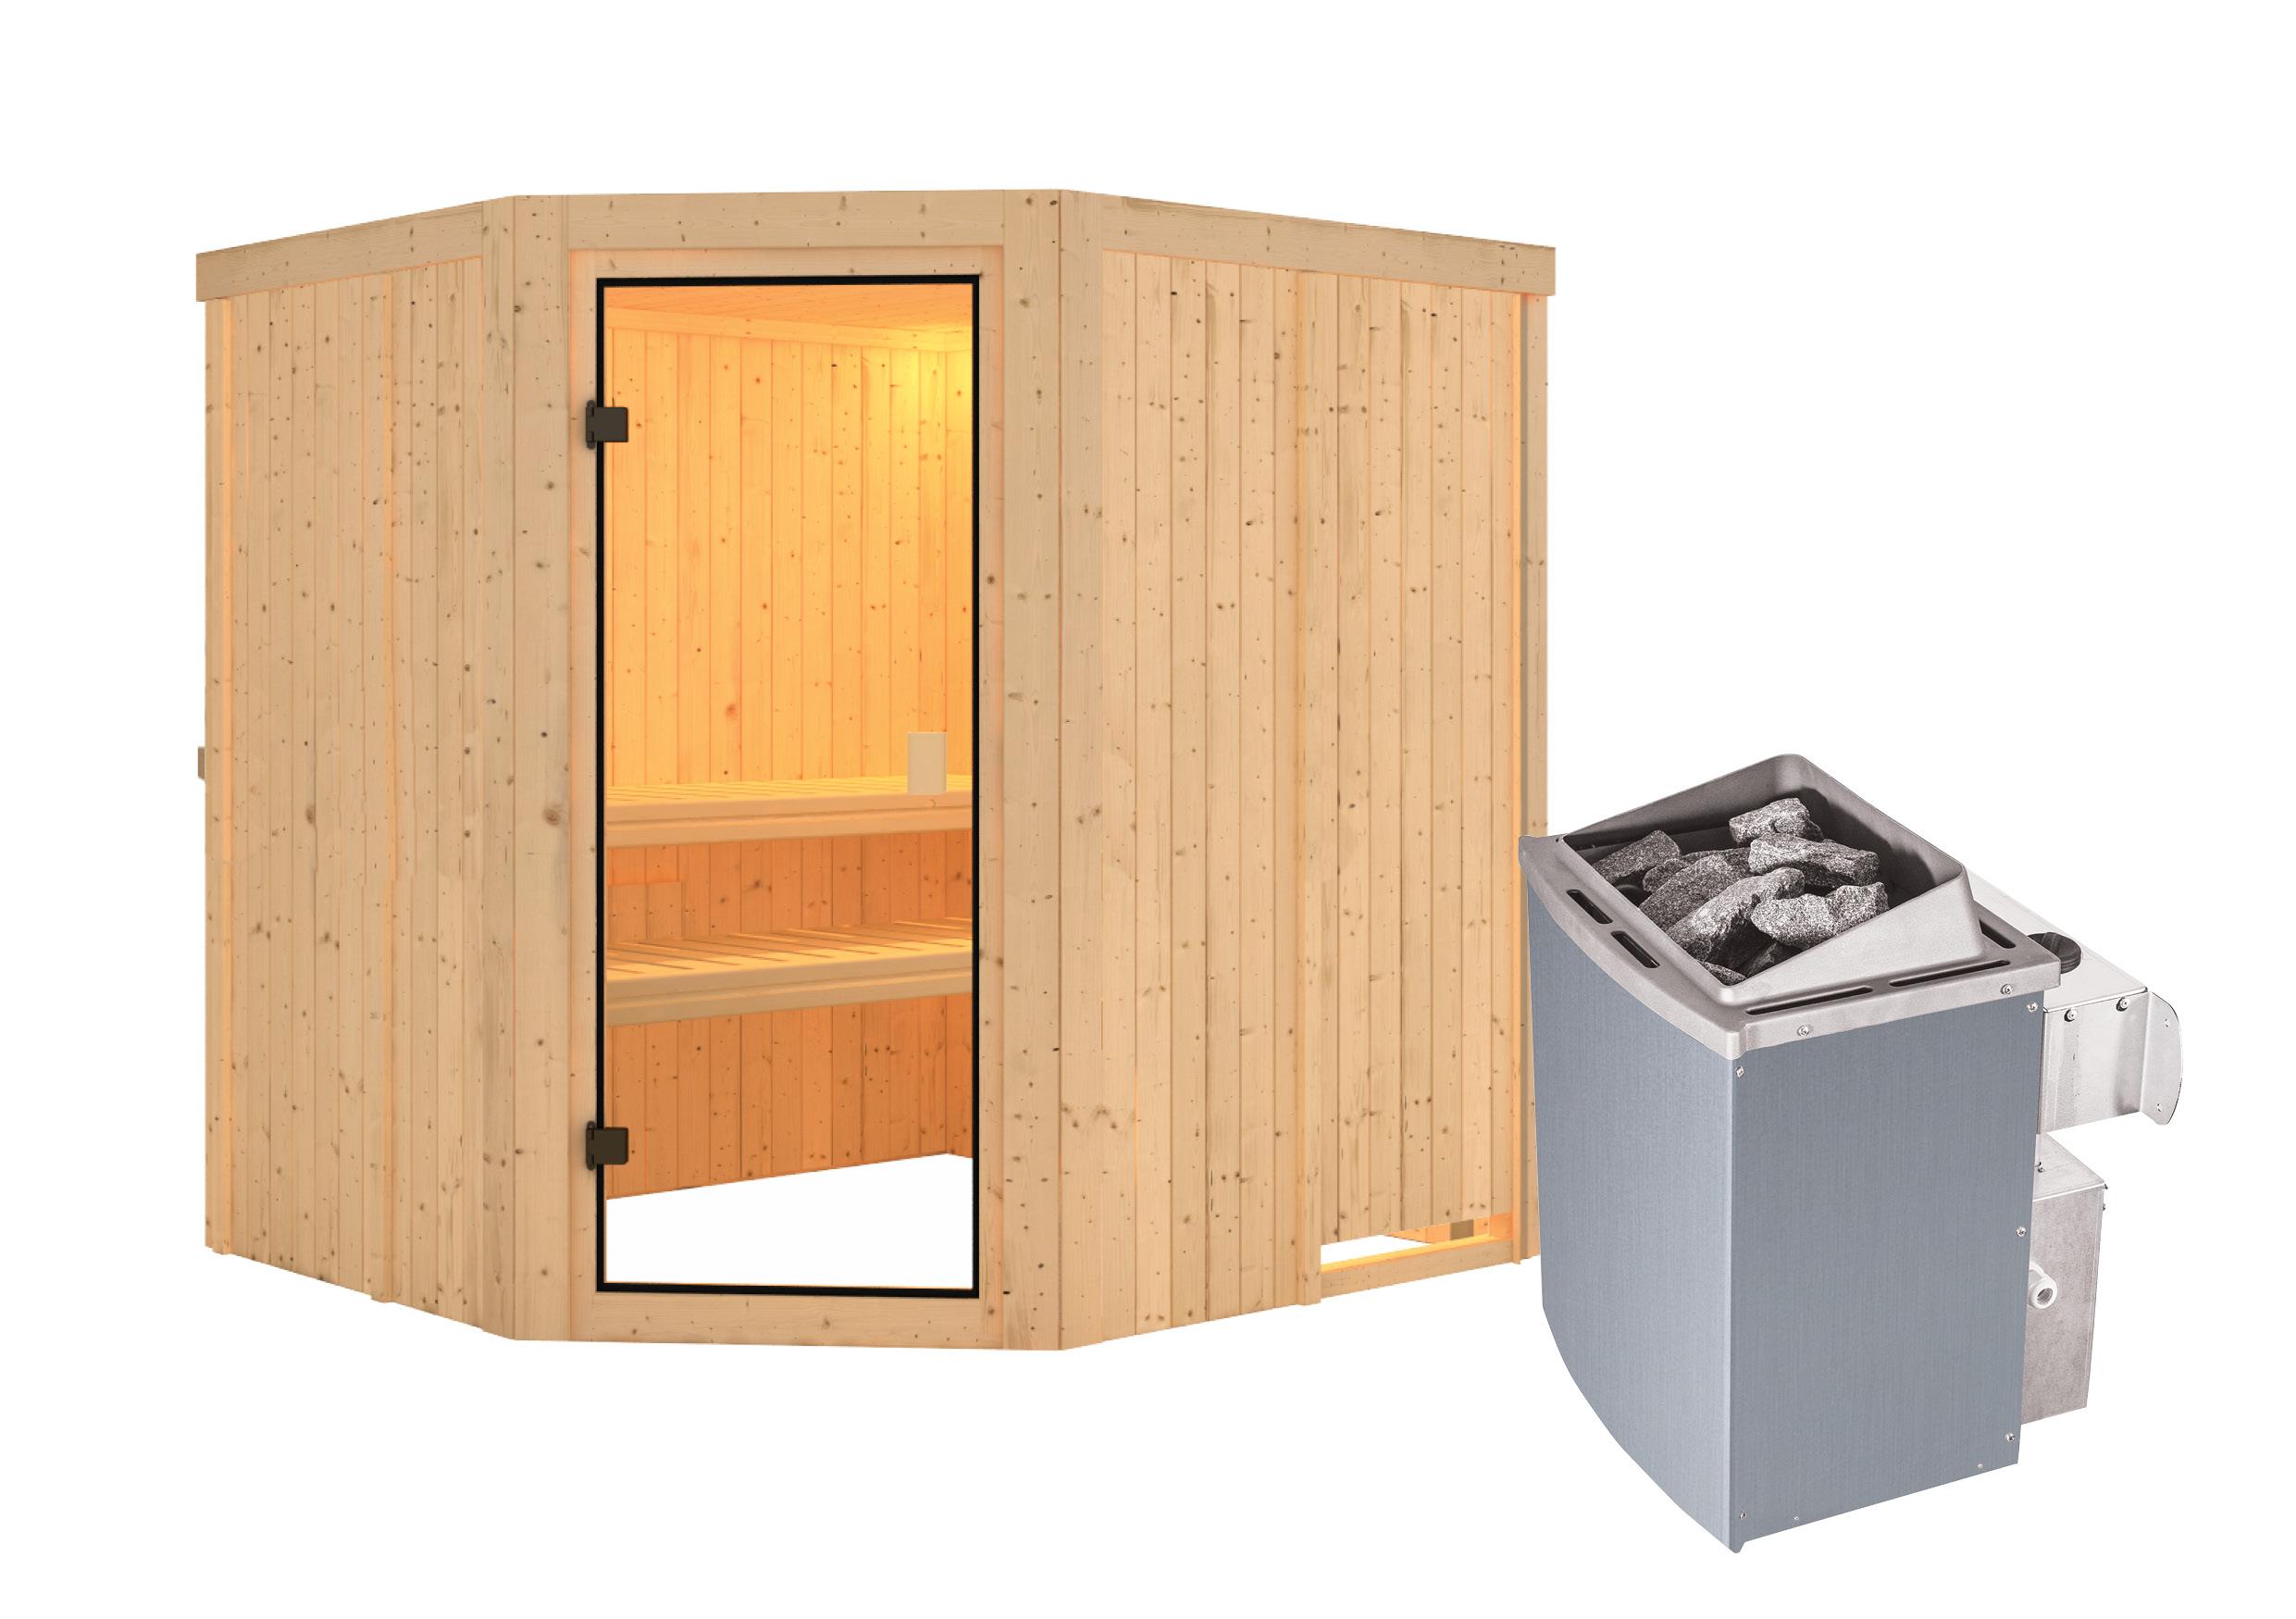 Woodfeeling Sauna Bodo 68mm Saunaofen 9kW intern Bild 11